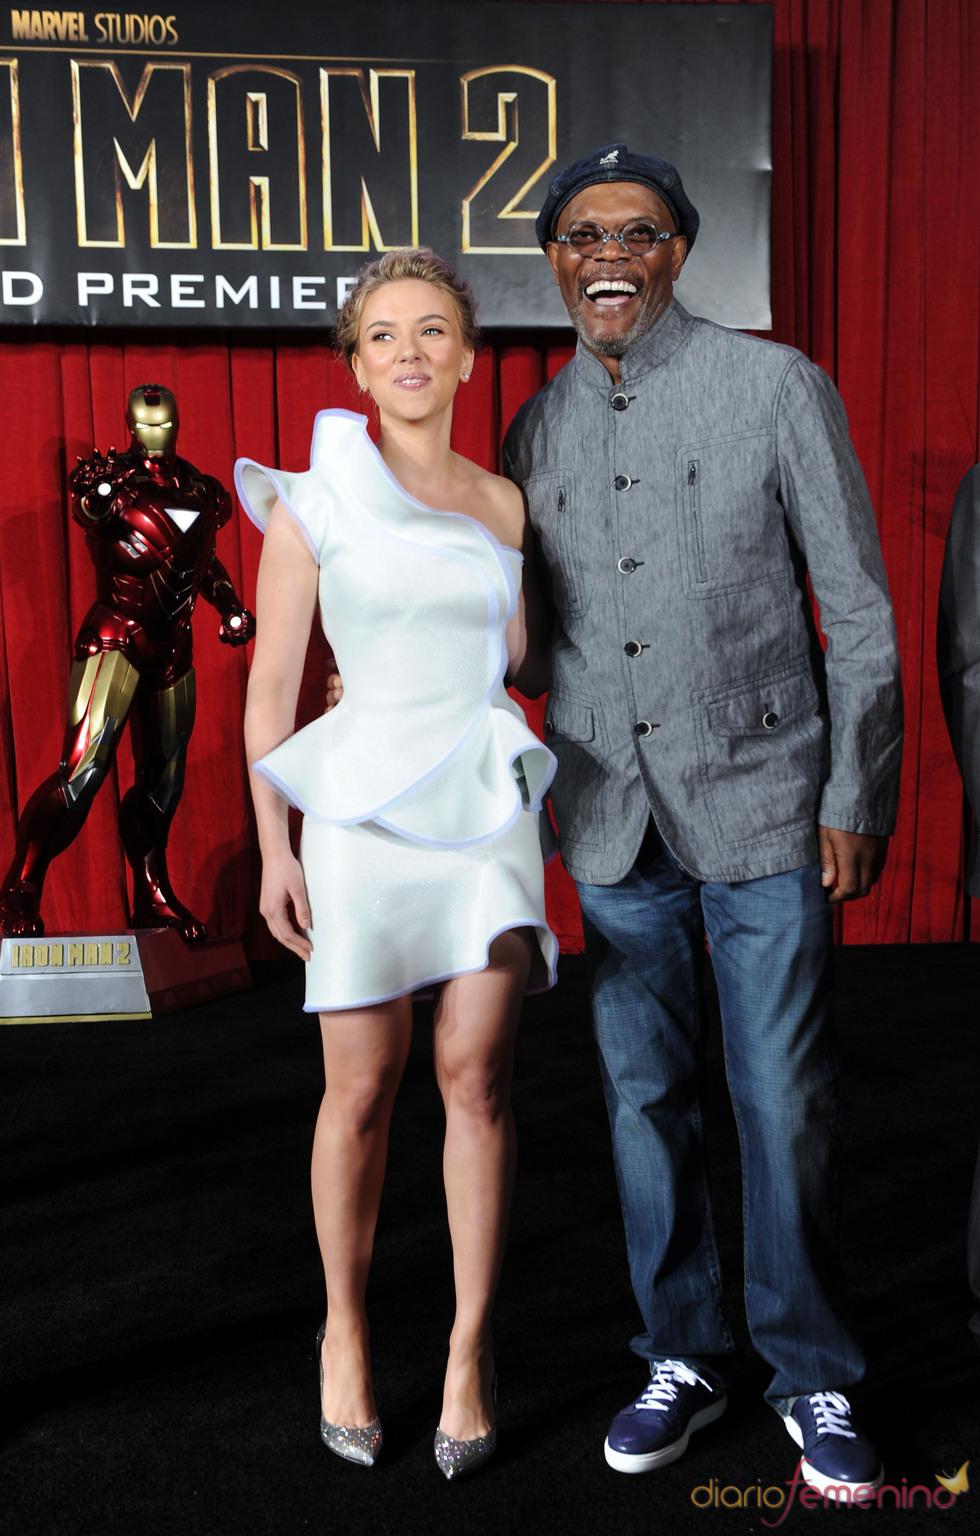 Scarlett Johansson y Samuel L. Jackson en la premiere de 'Iron Man 2'